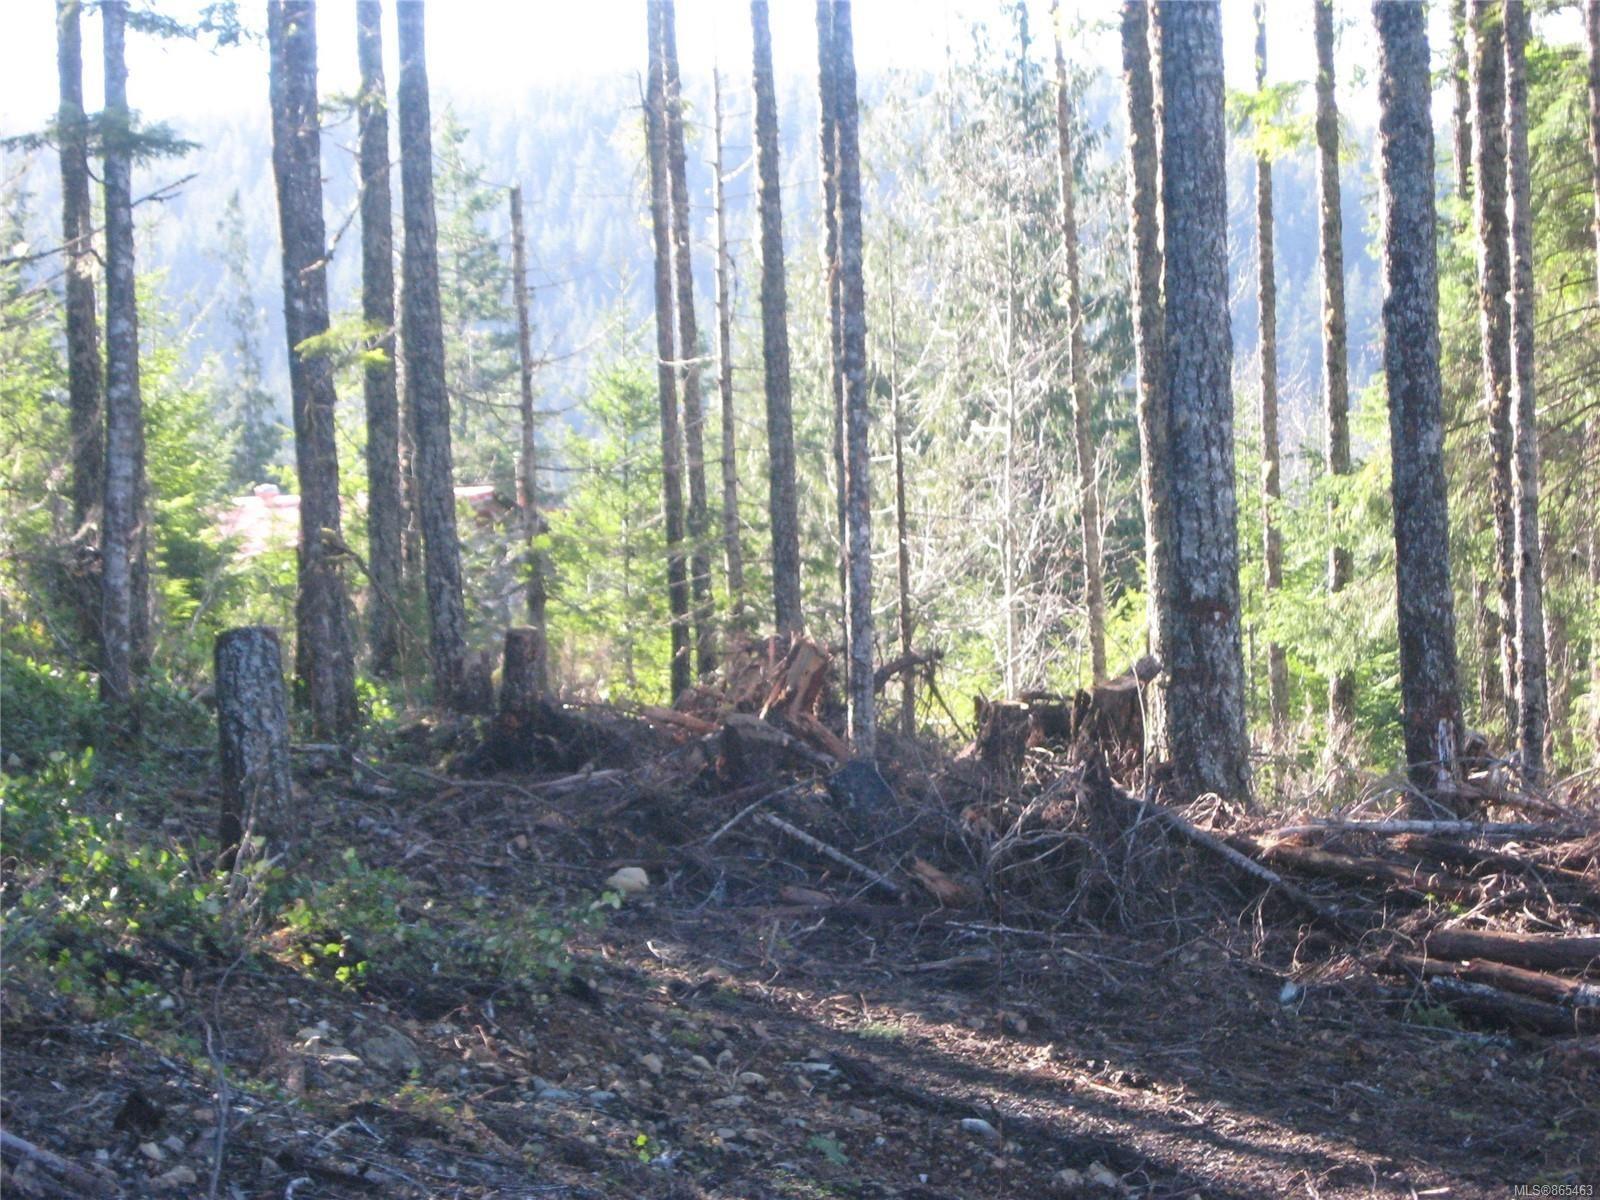 Photo 7: Photos: 1230 Cottonwood Rd in : NI Kelsey Bay/Sayward Land for sale (North Island)  : MLS®# 865463